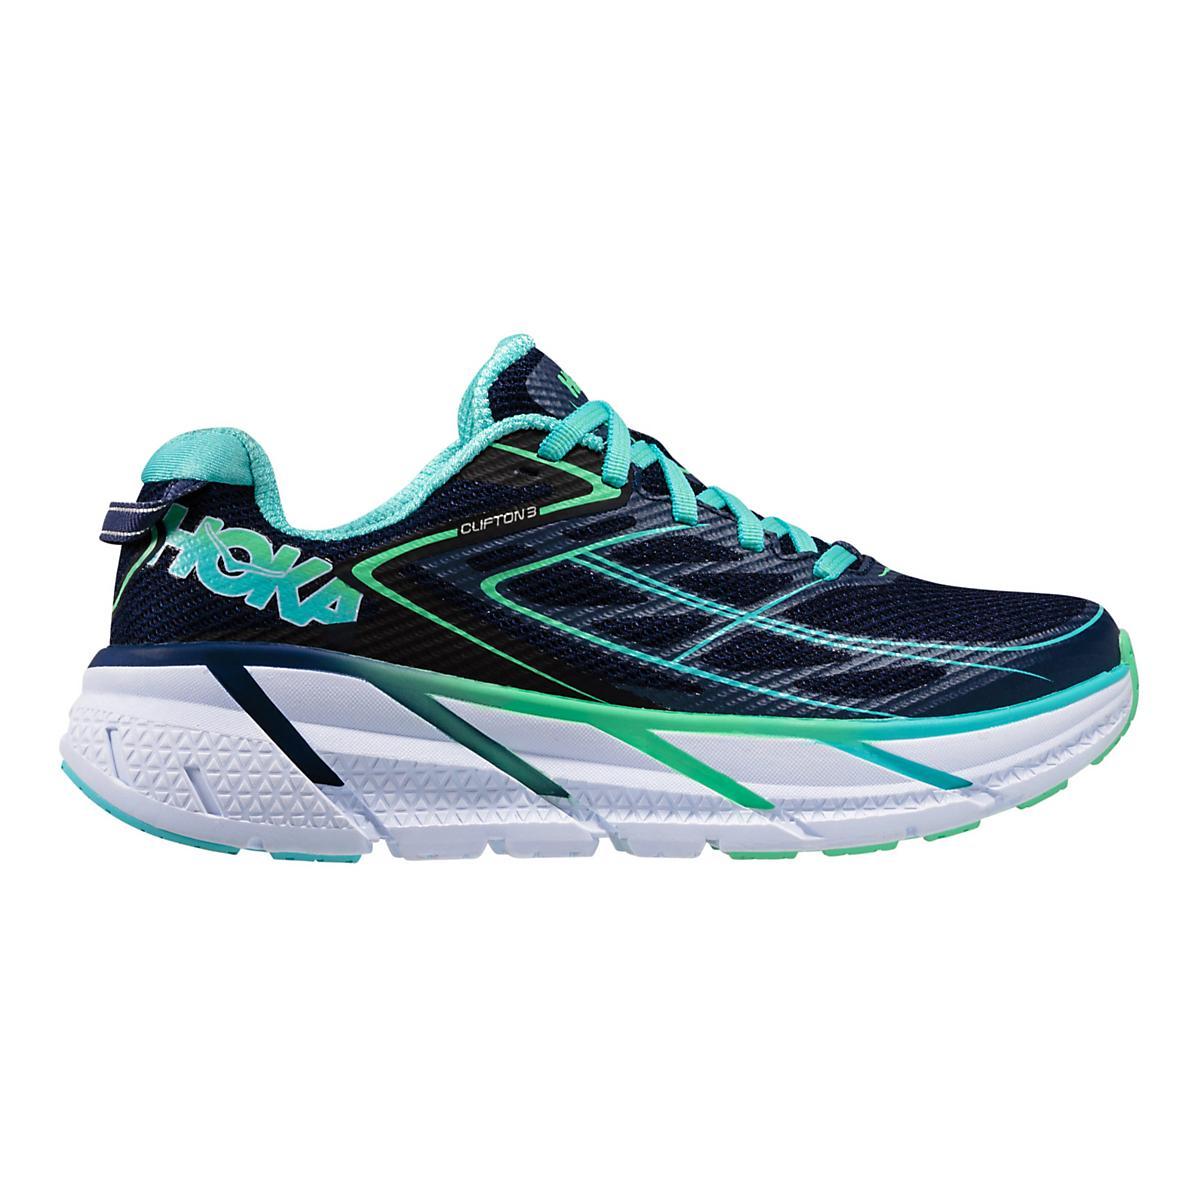 Womens Hoka One One Clifton 3 Running Shoe At Road Runner